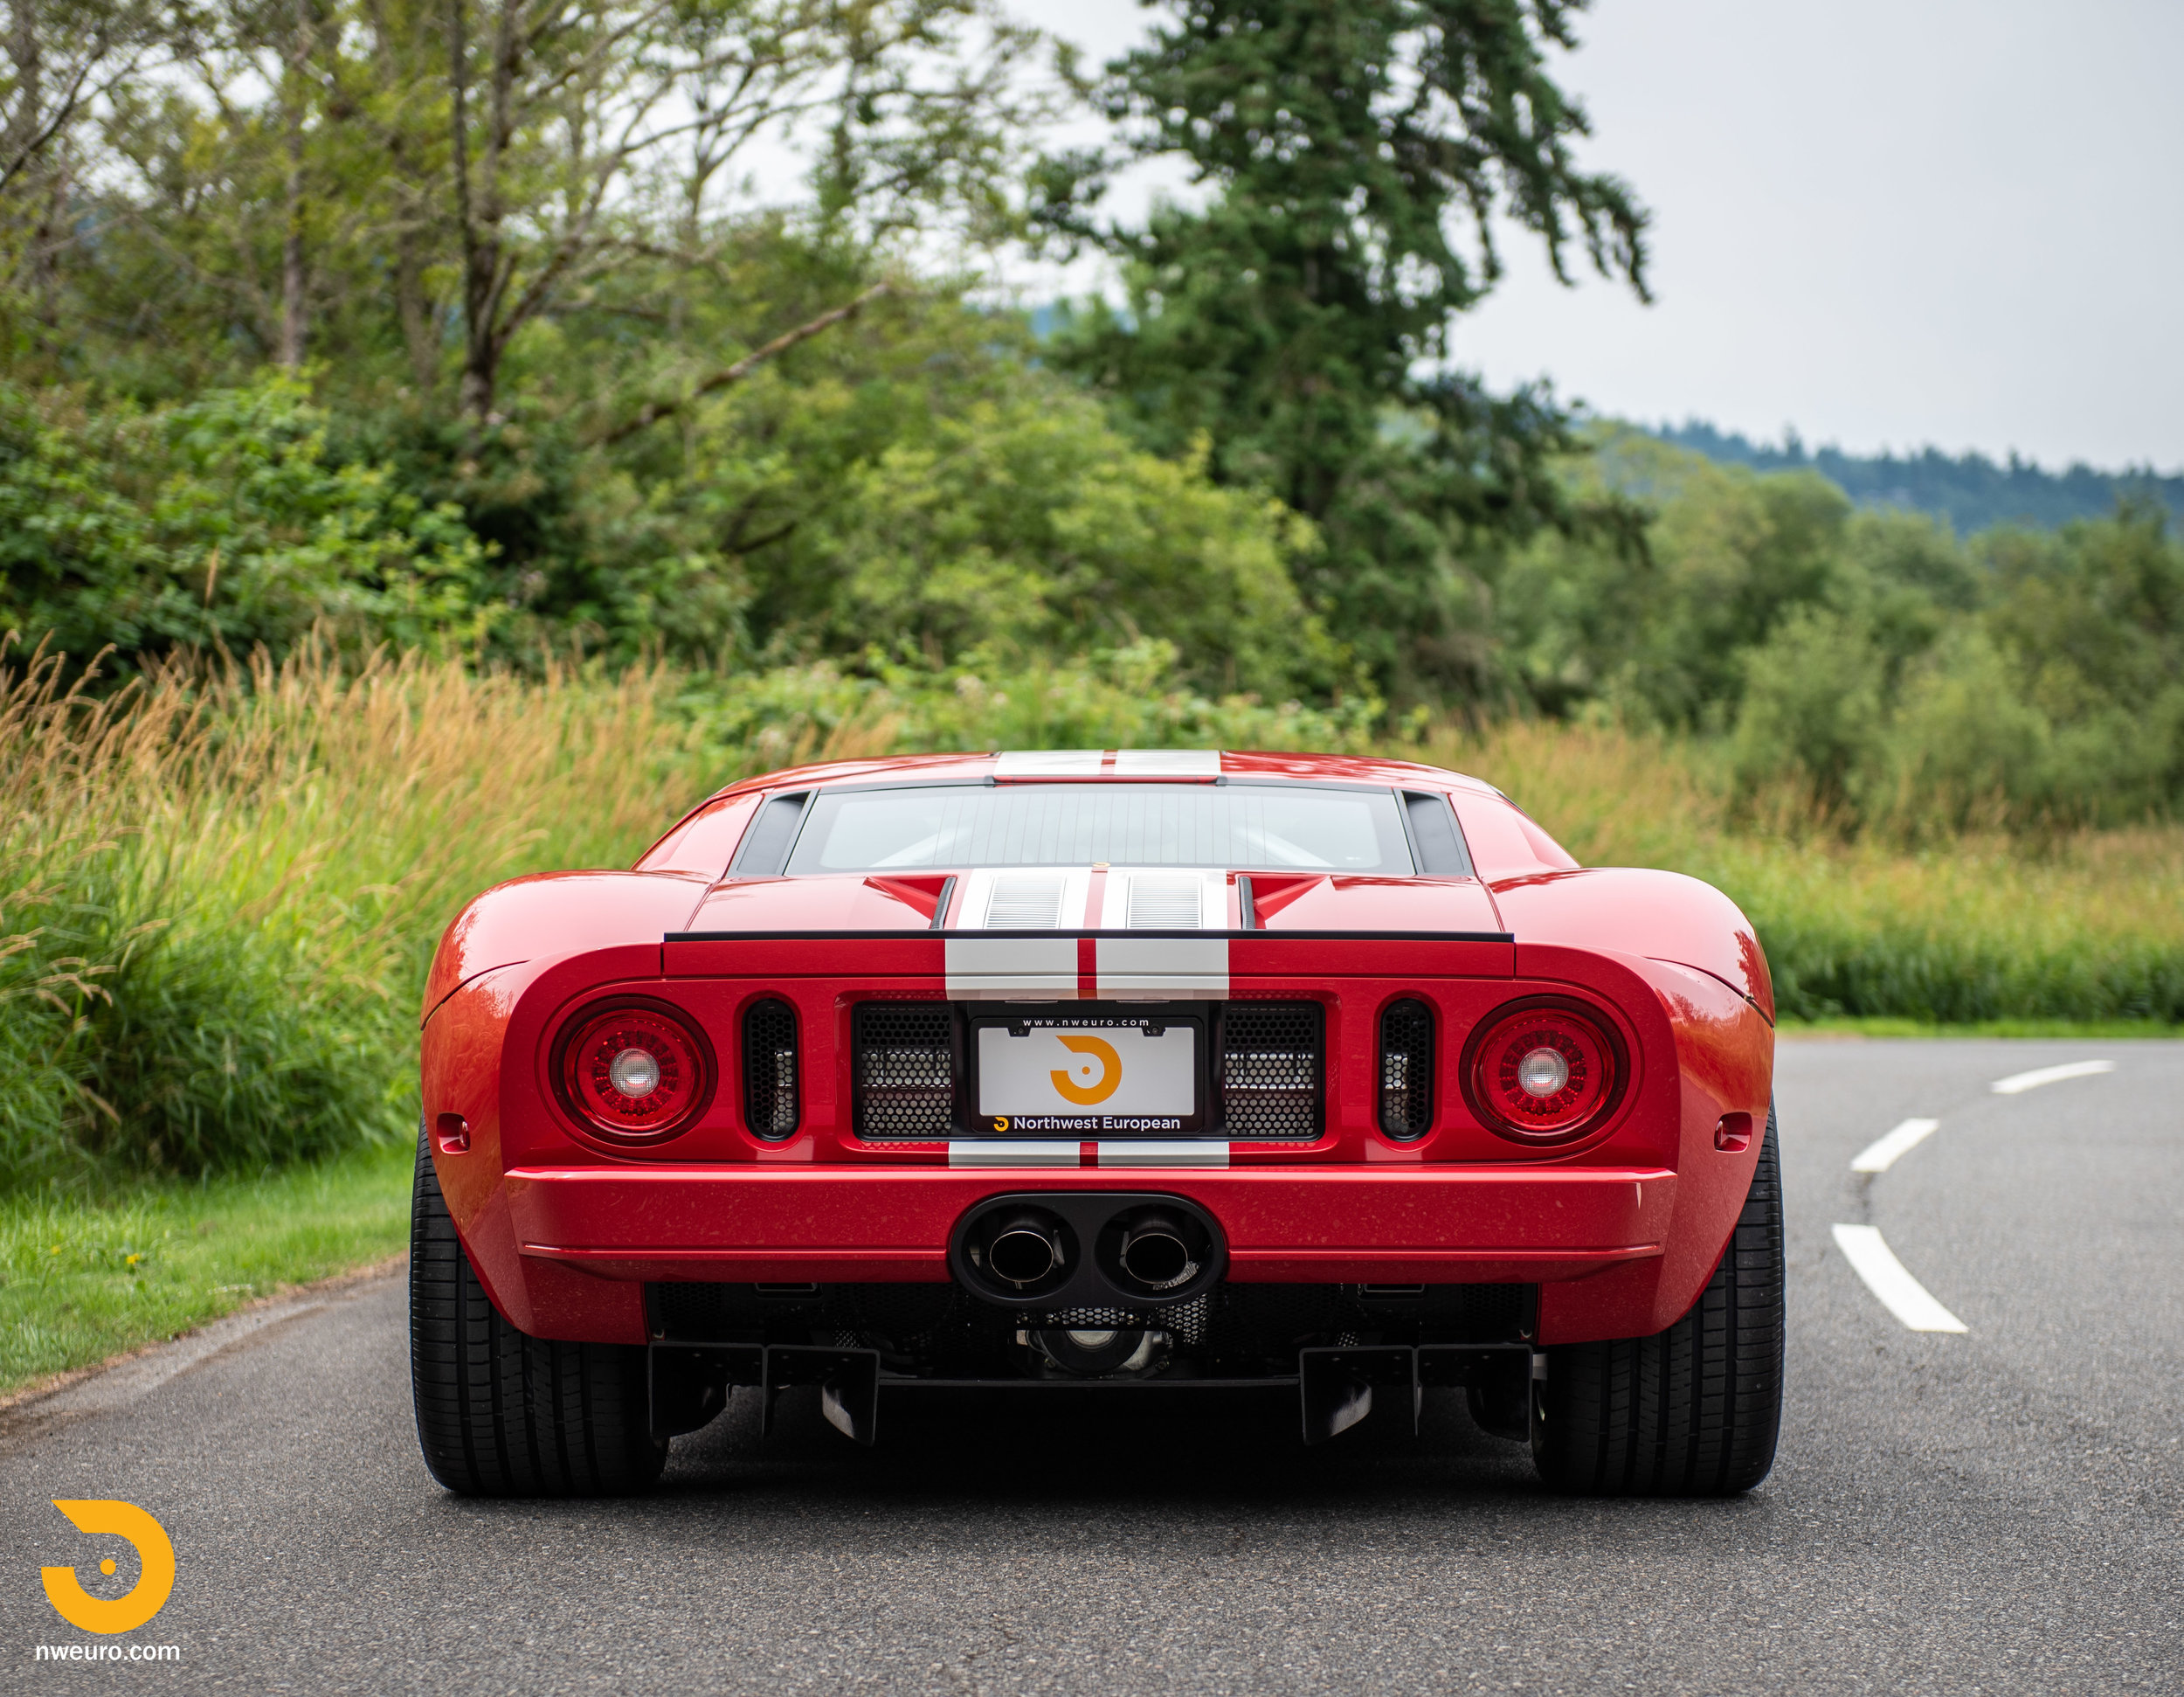 2005 Ford GT Red-84.jpg